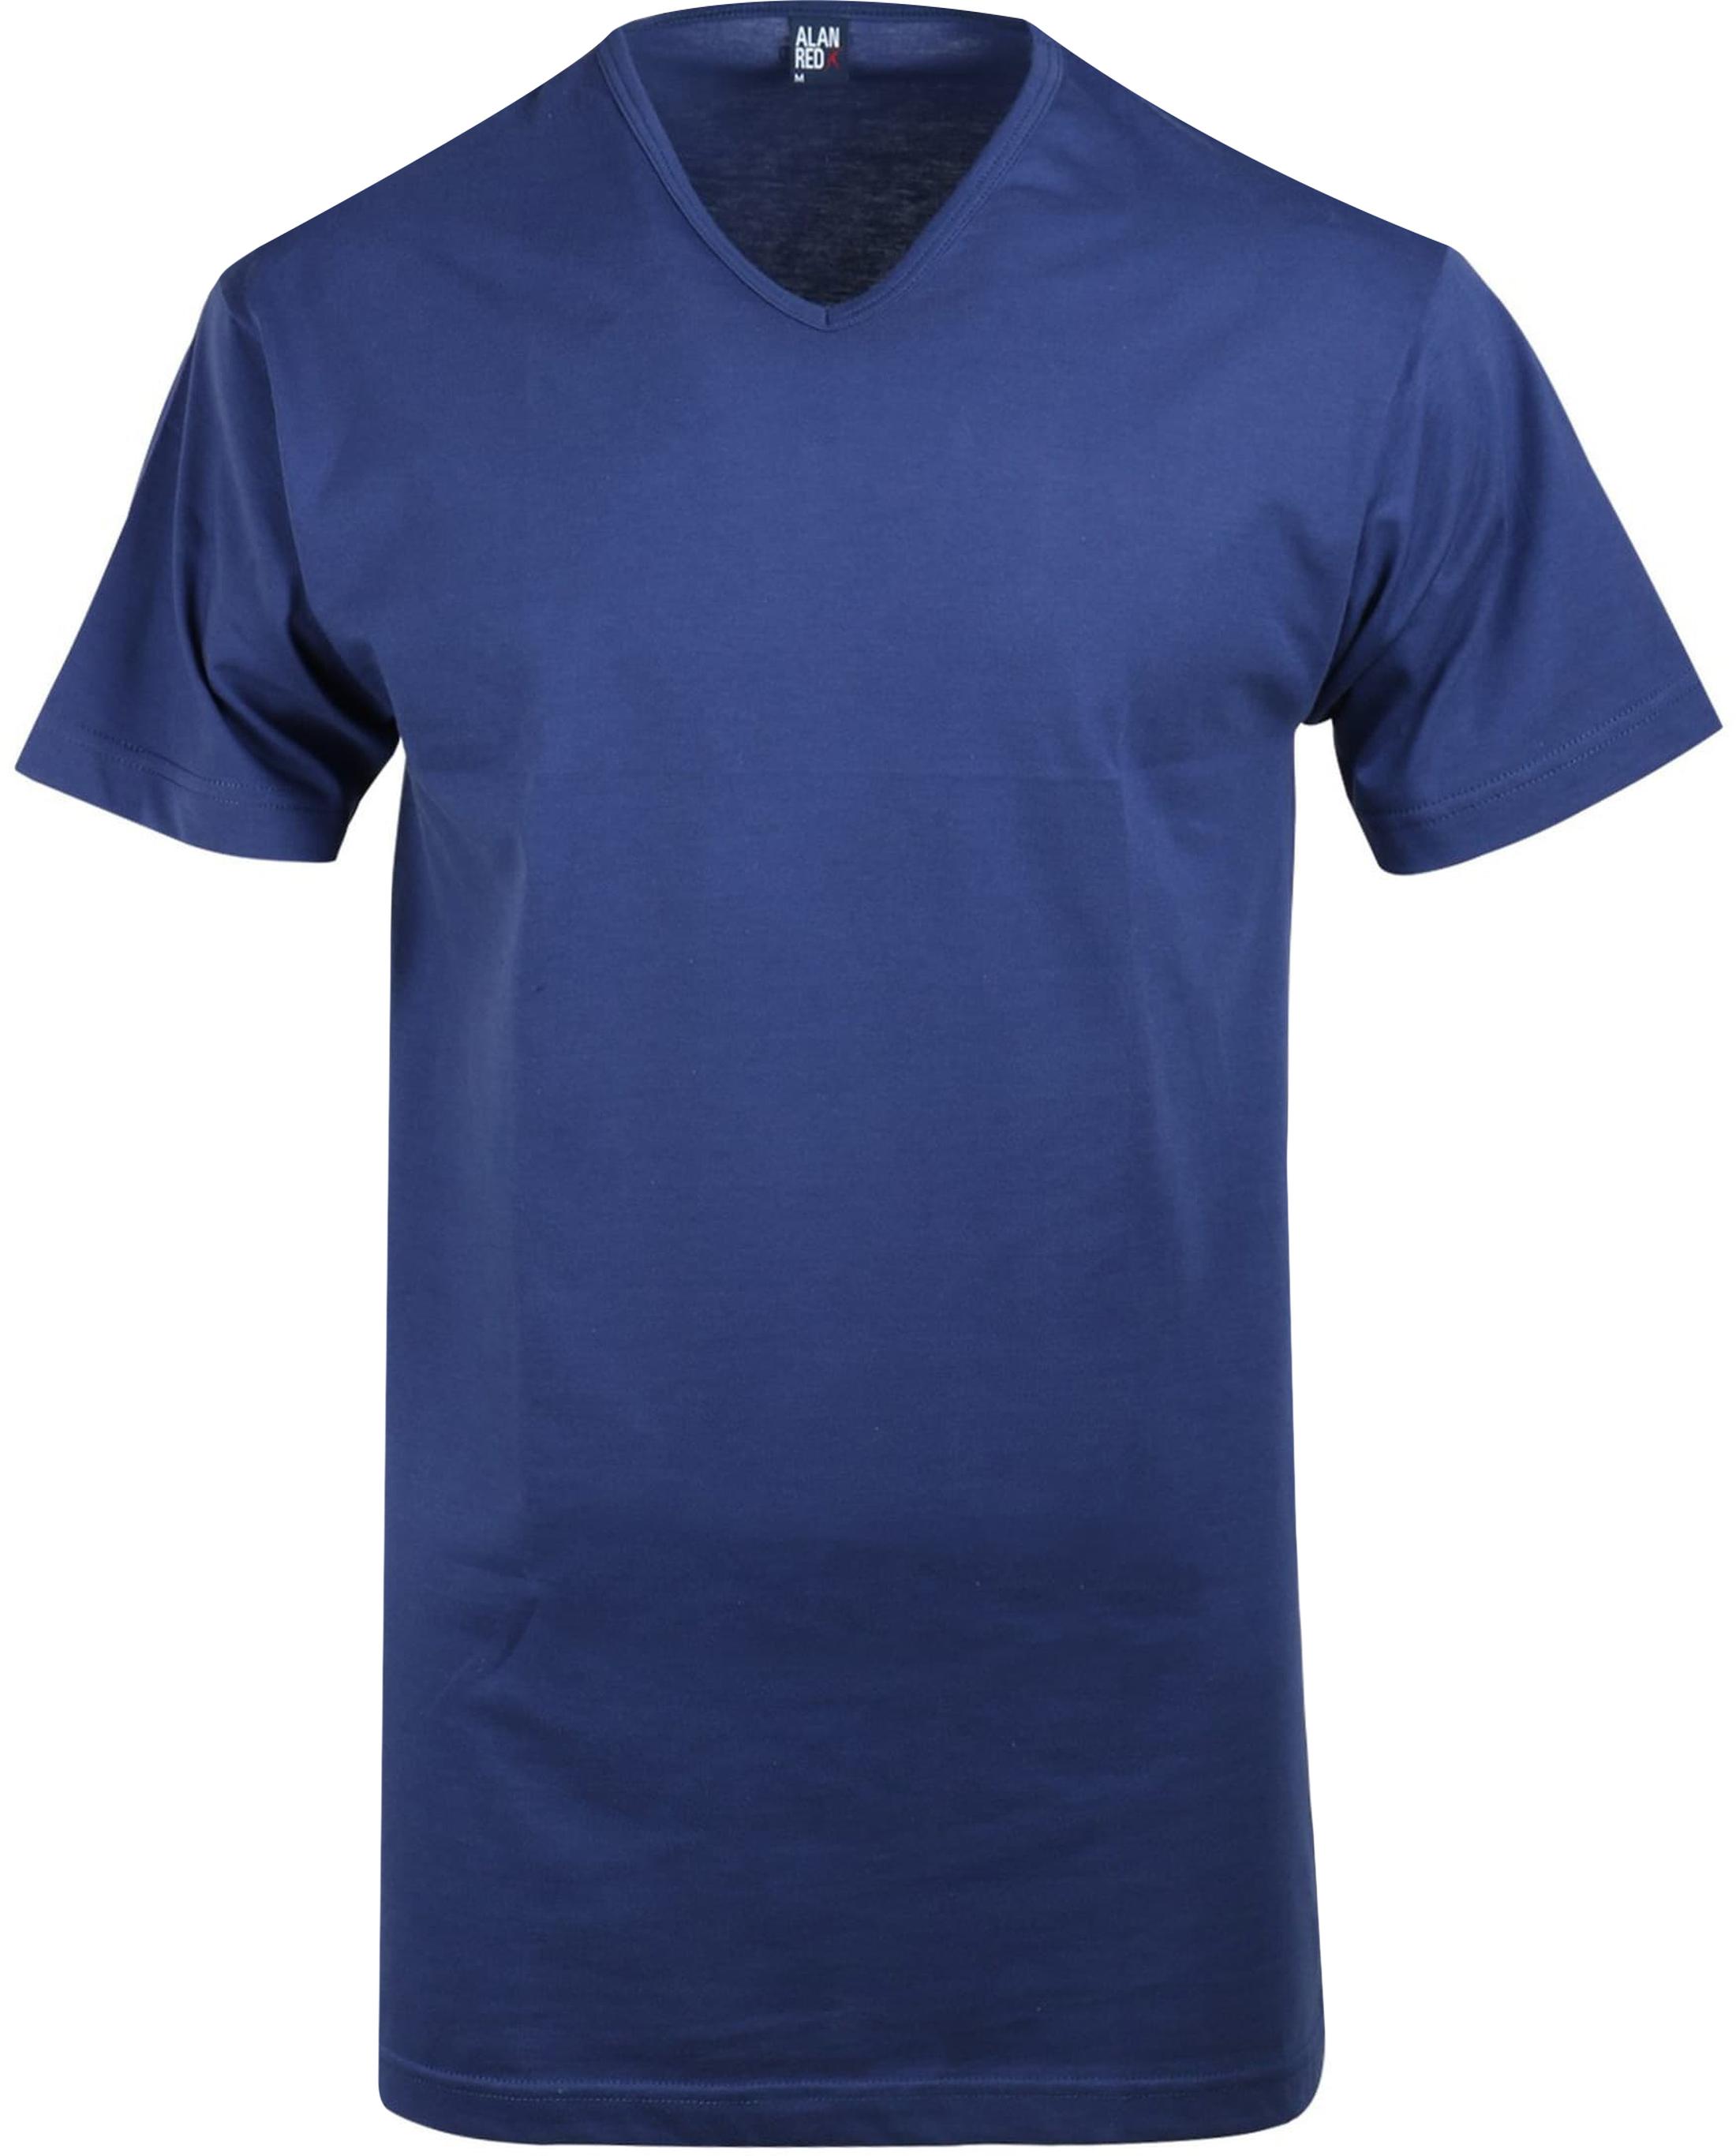 Alan Red T-Shirt V-Ausschnitt Vermont Marineblau (1er-Pack) foto 0